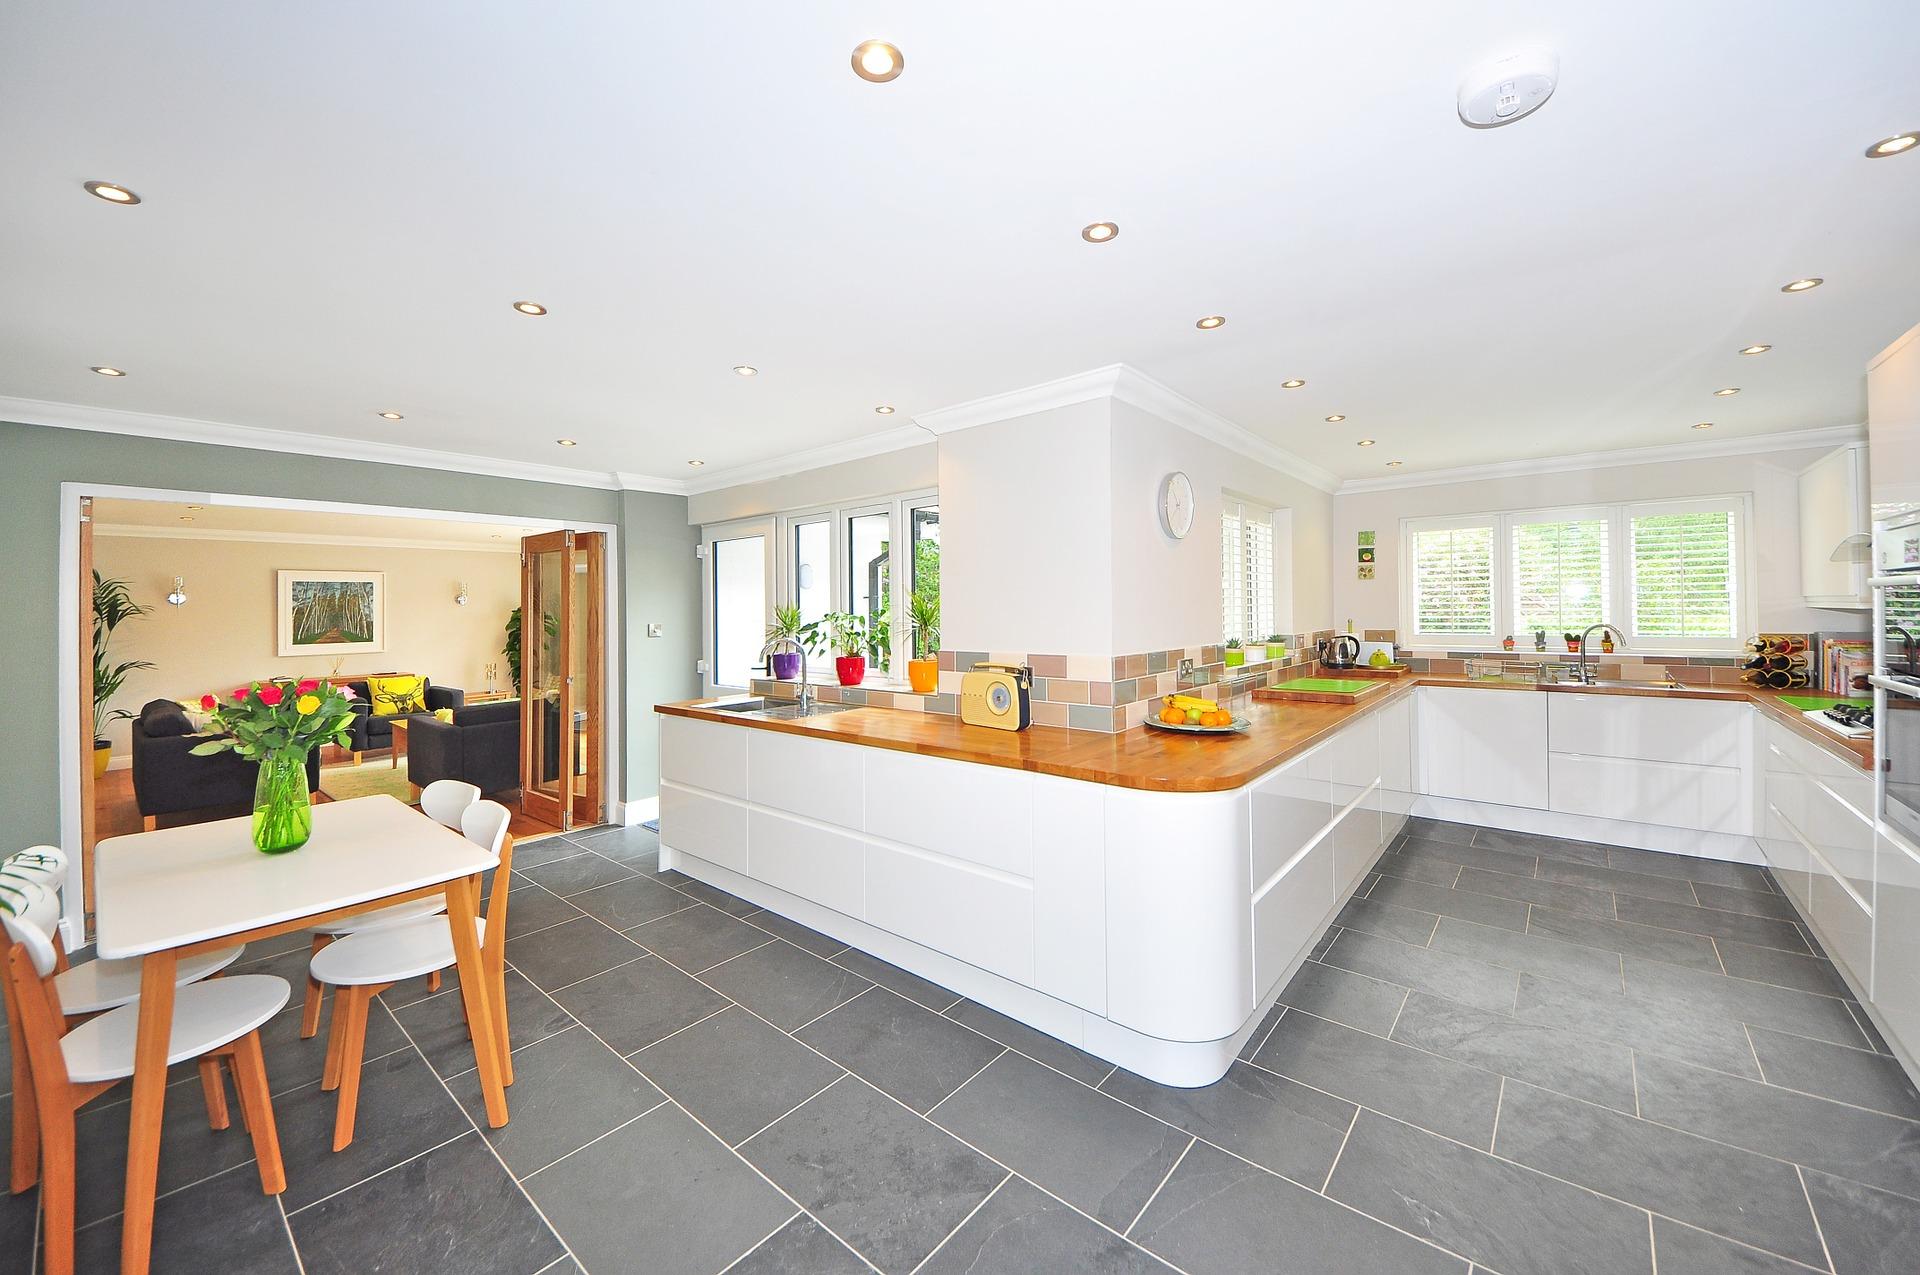 Cozinha moderna aberta